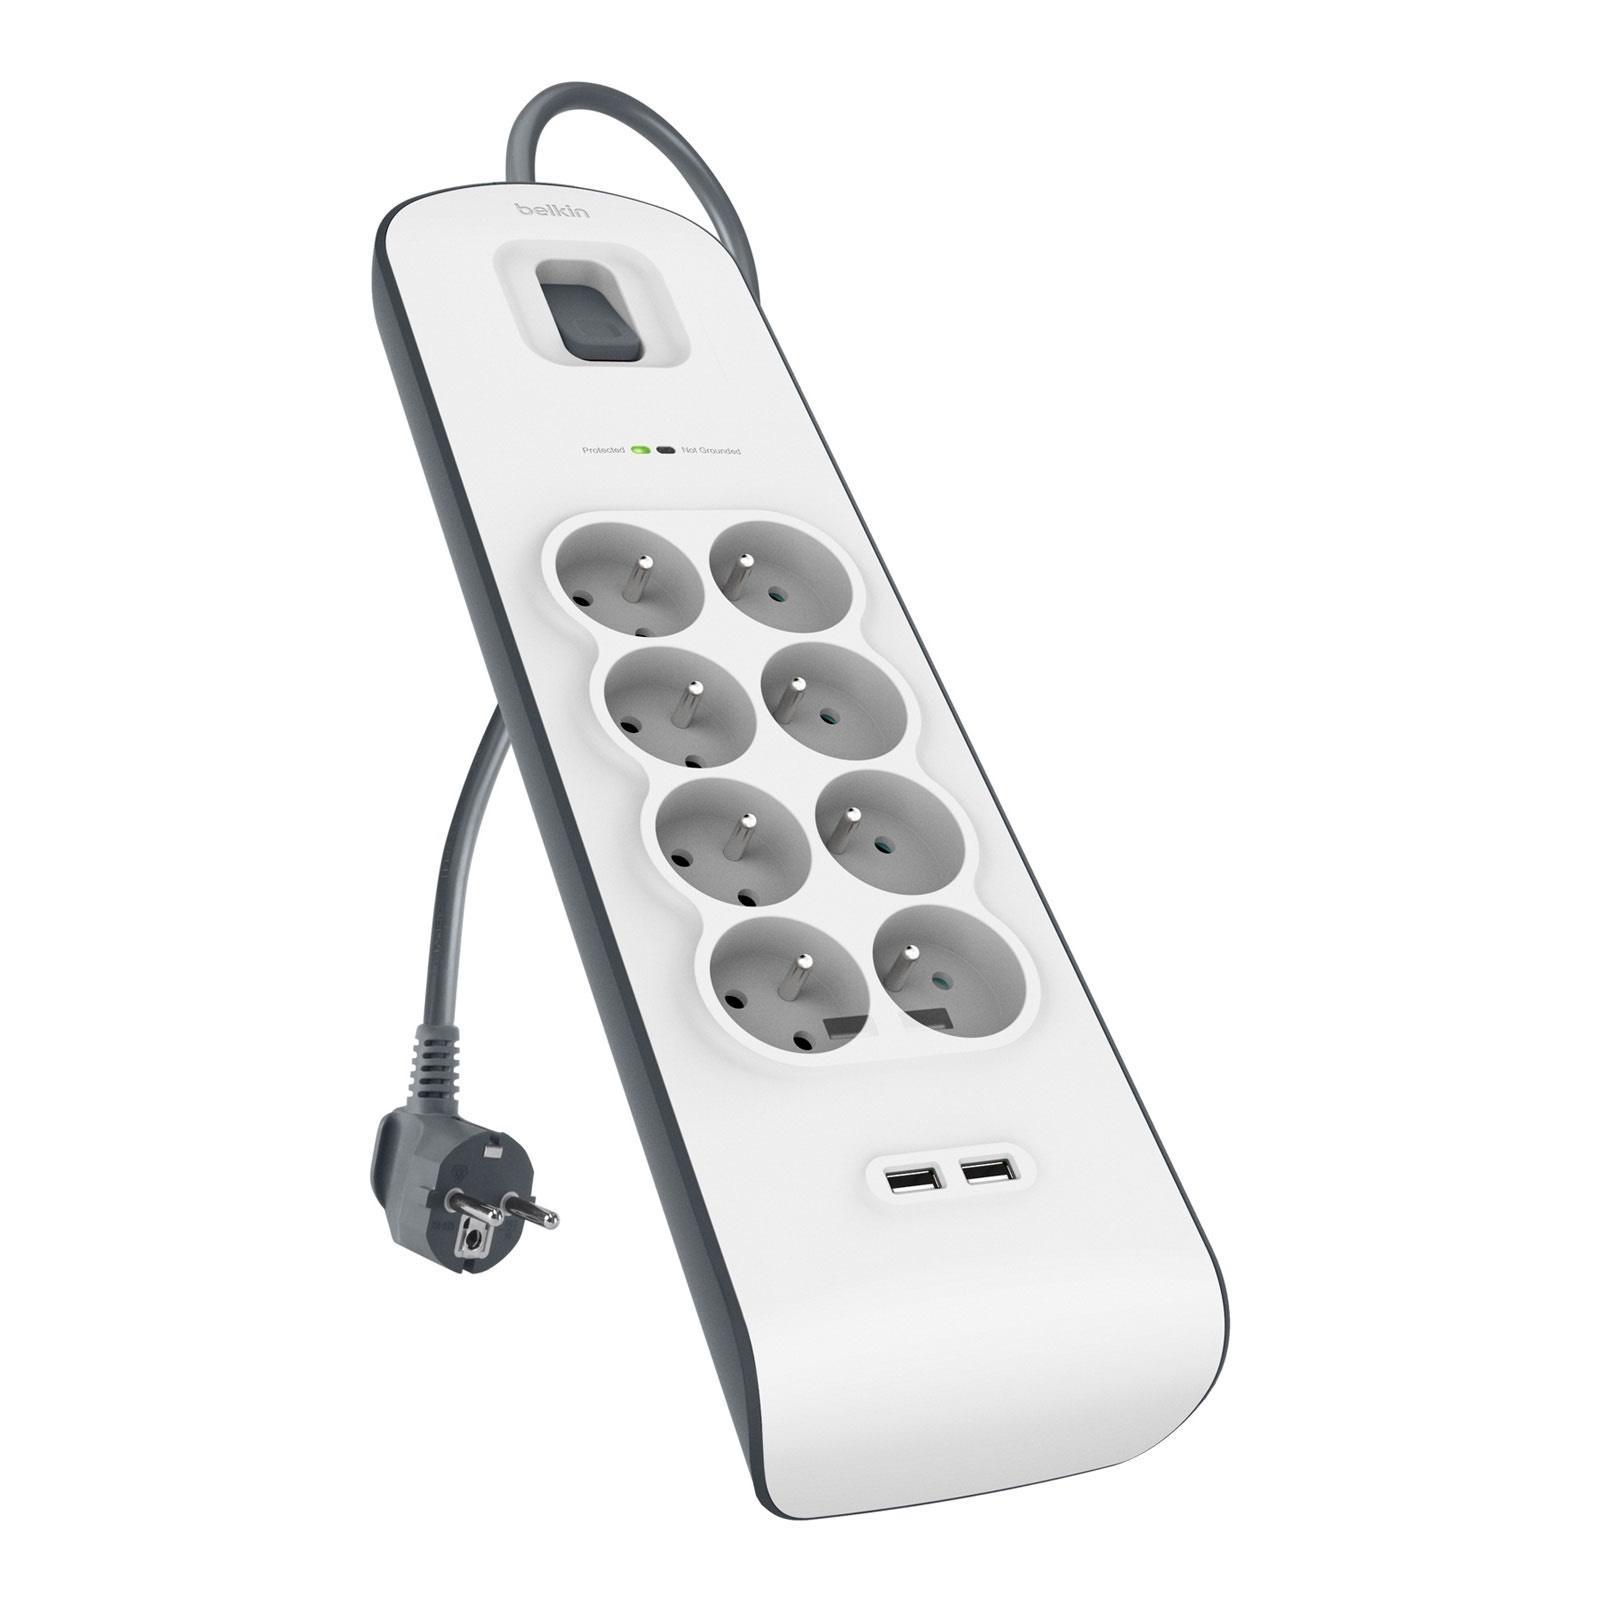 Multiprise parafoudre Belkin 8 prises + 2 ports USB